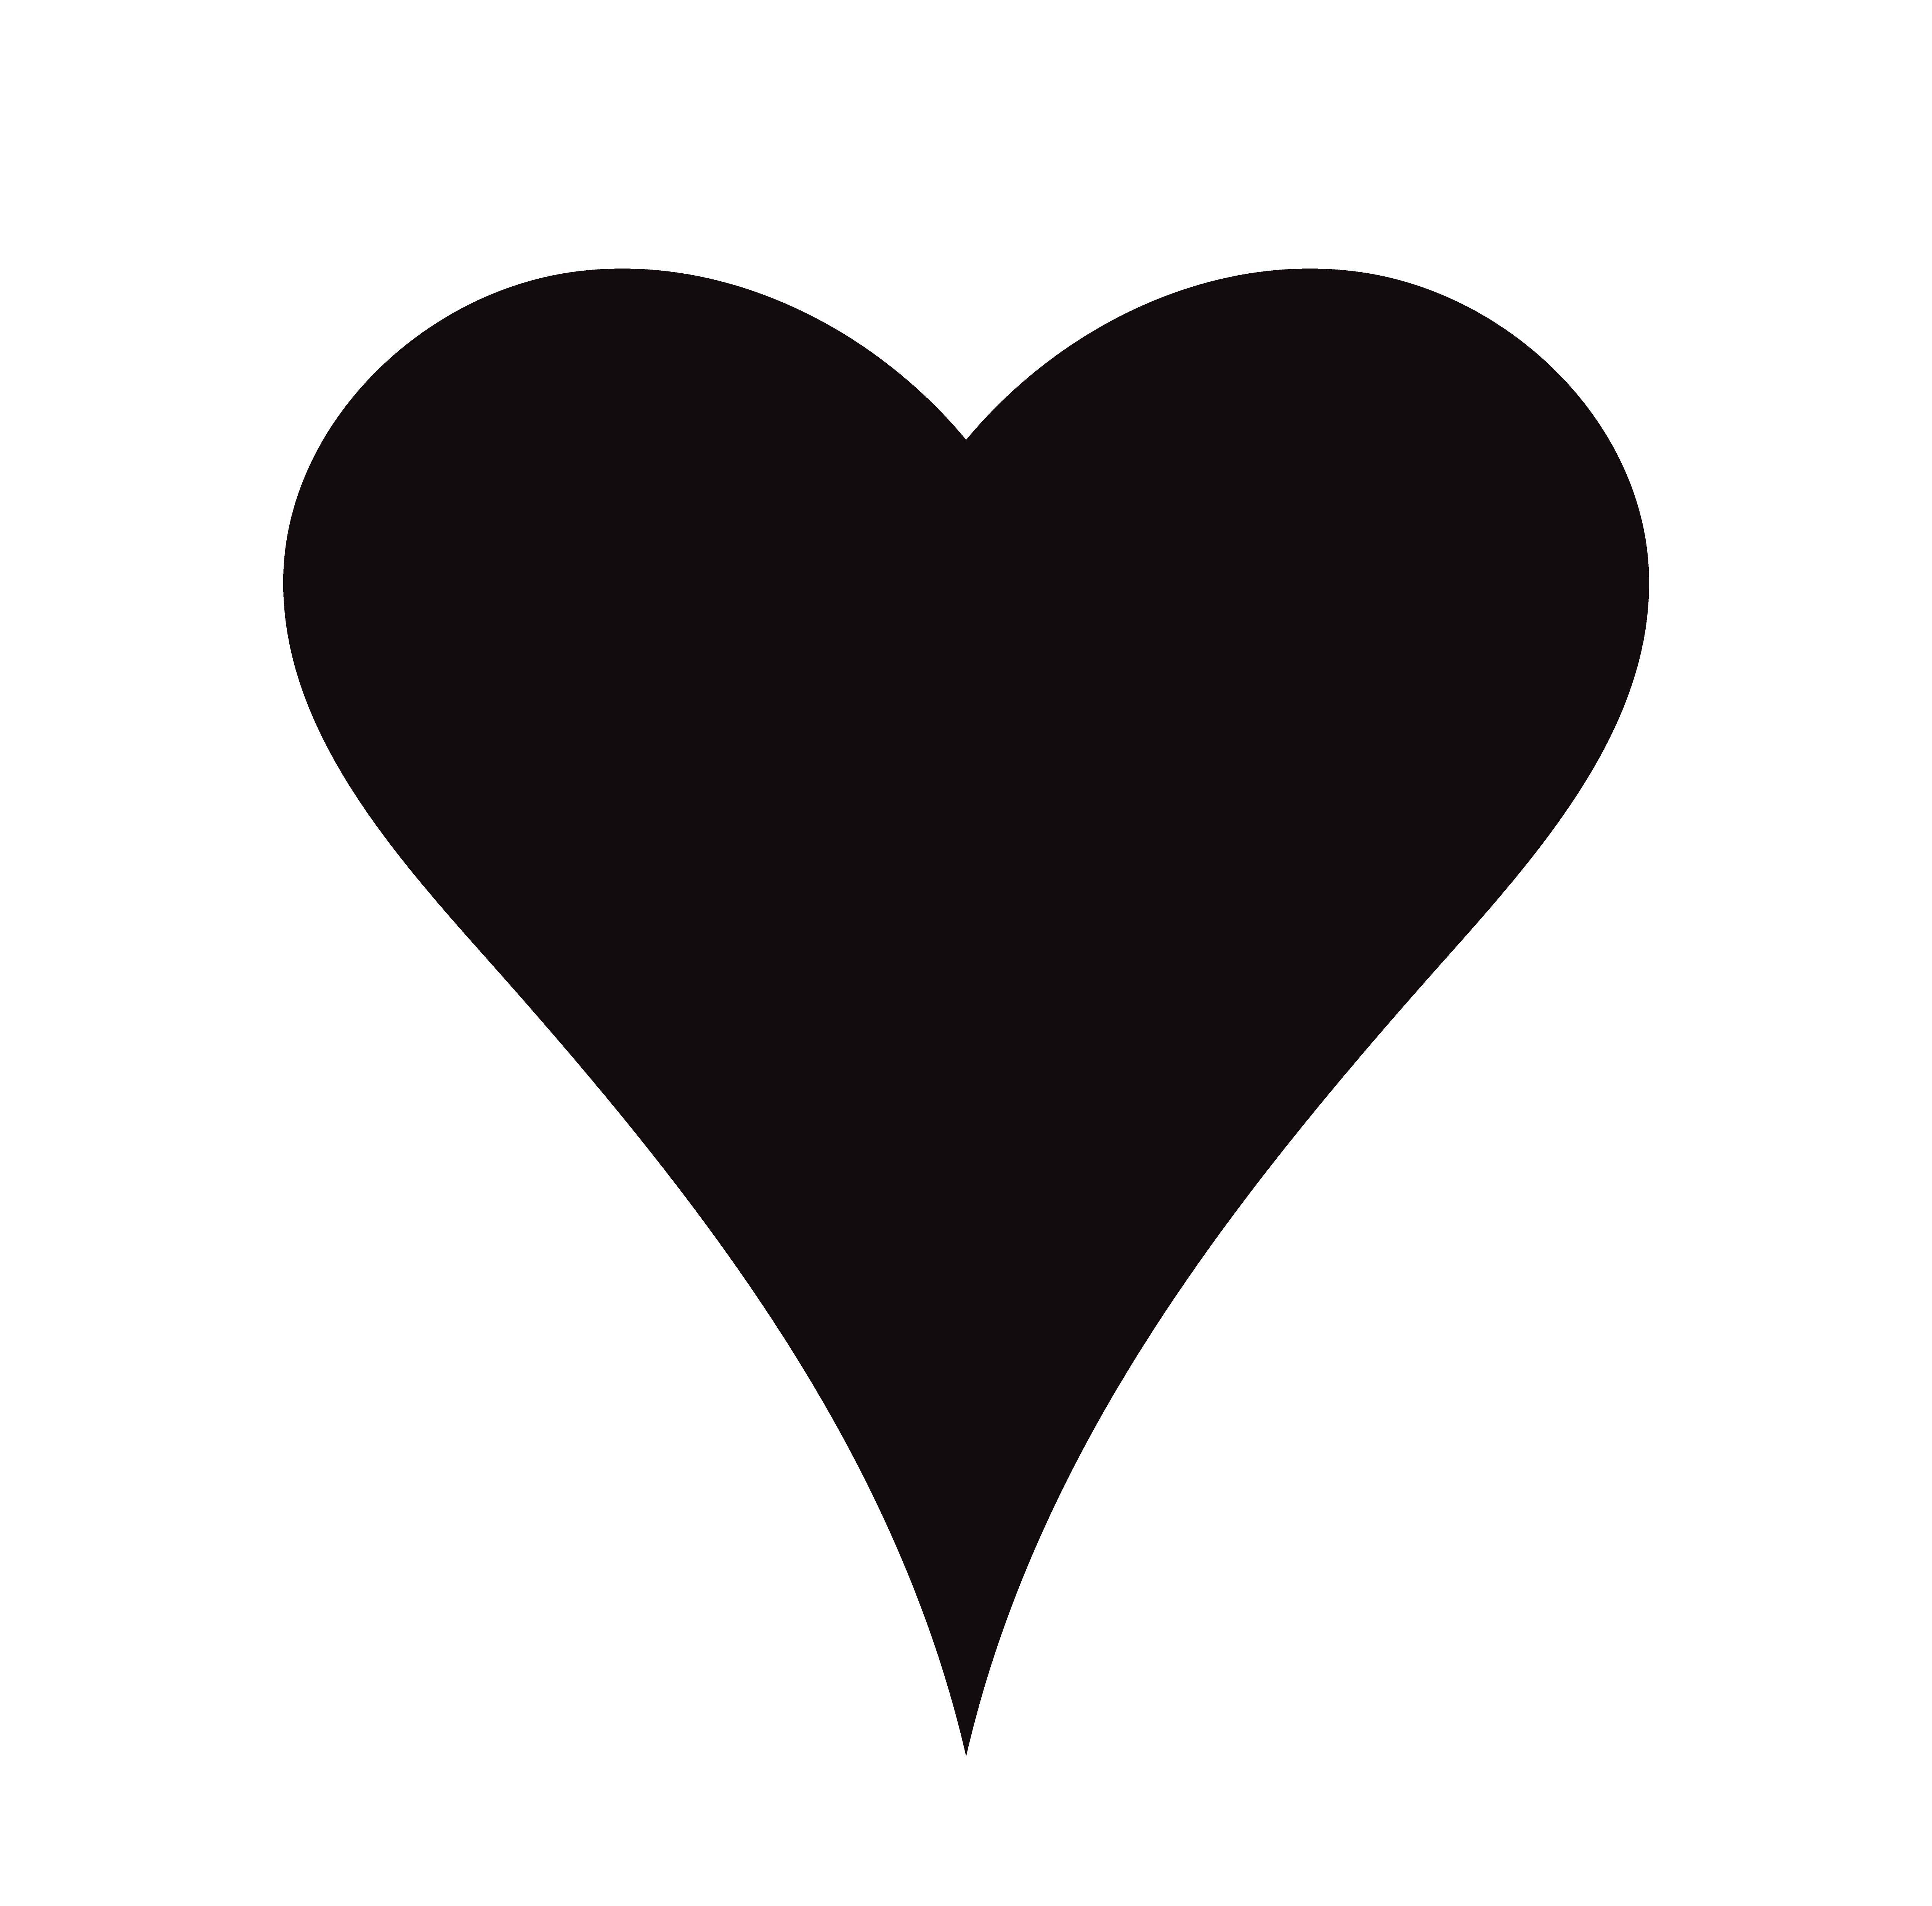 Flat Black Heart Icon Isolated On White Background Vector Illustration Heart Icons Black Heart Heart Illustration